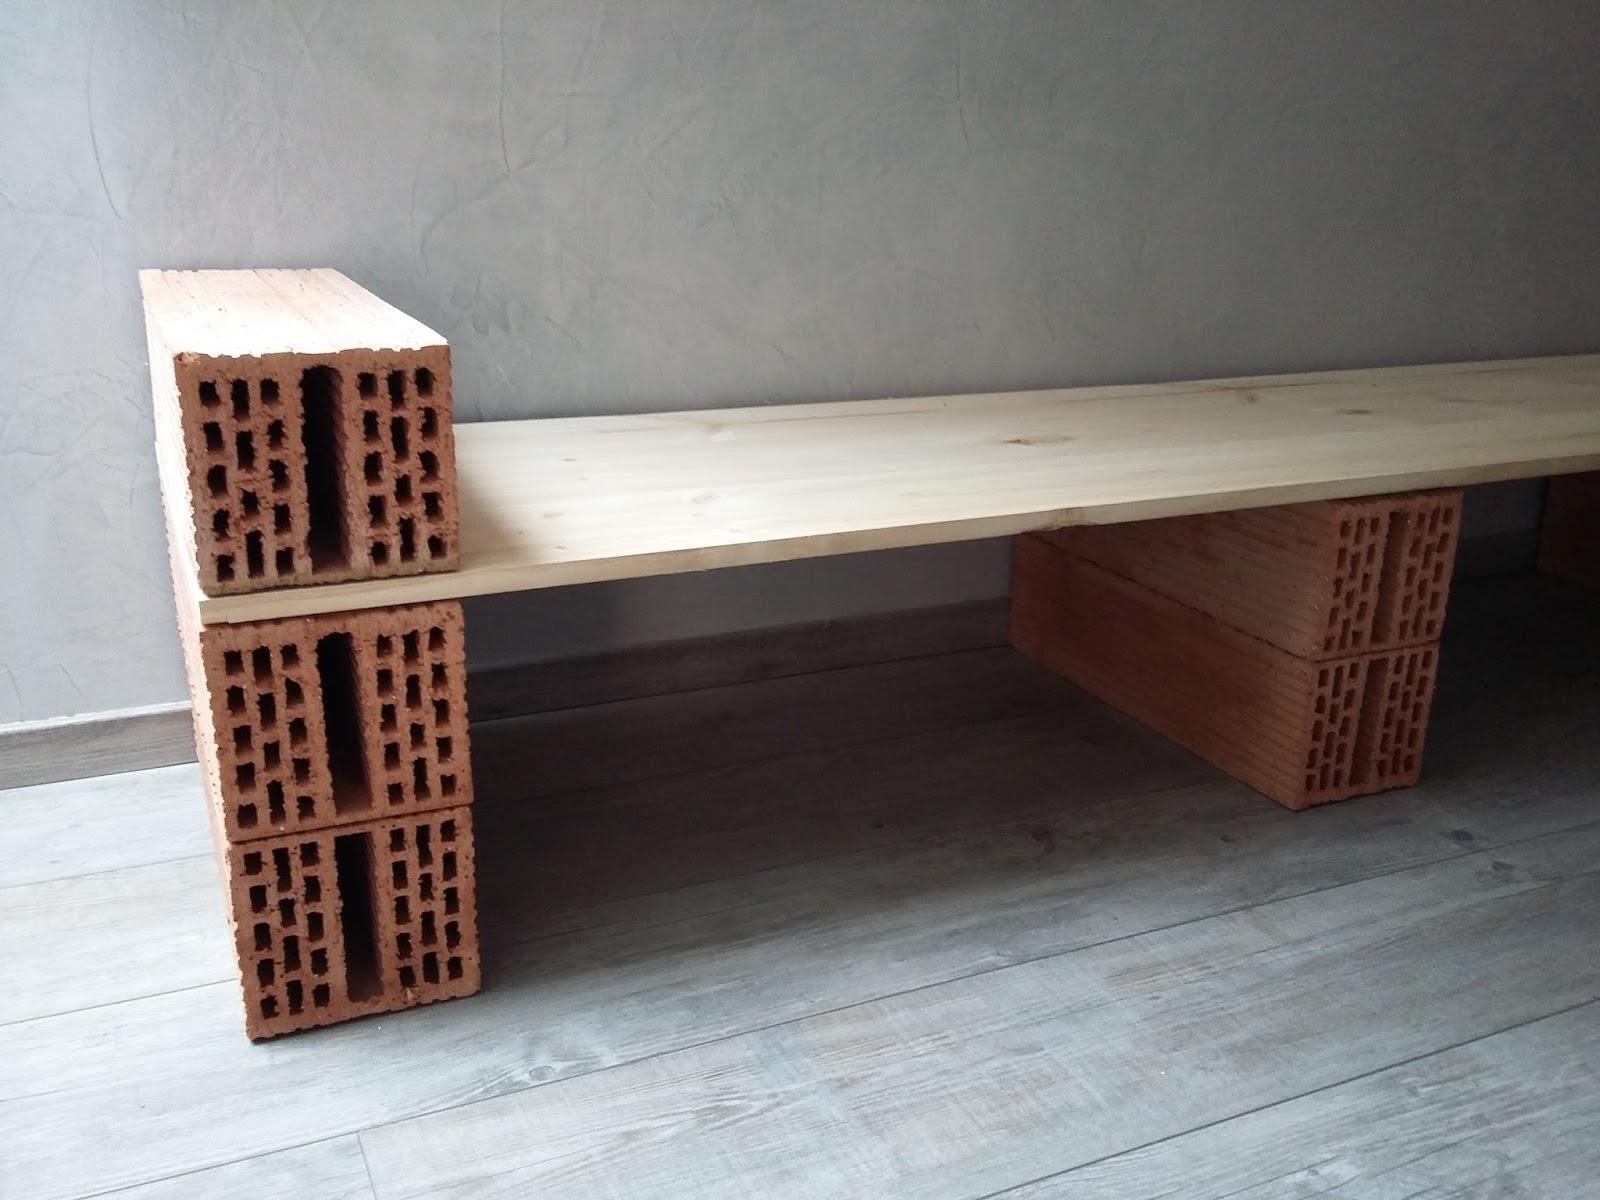 bricolage de l 39 id e la r alisation etag re au look. Black Bedroom Furniture Sets. Home Design Ideas